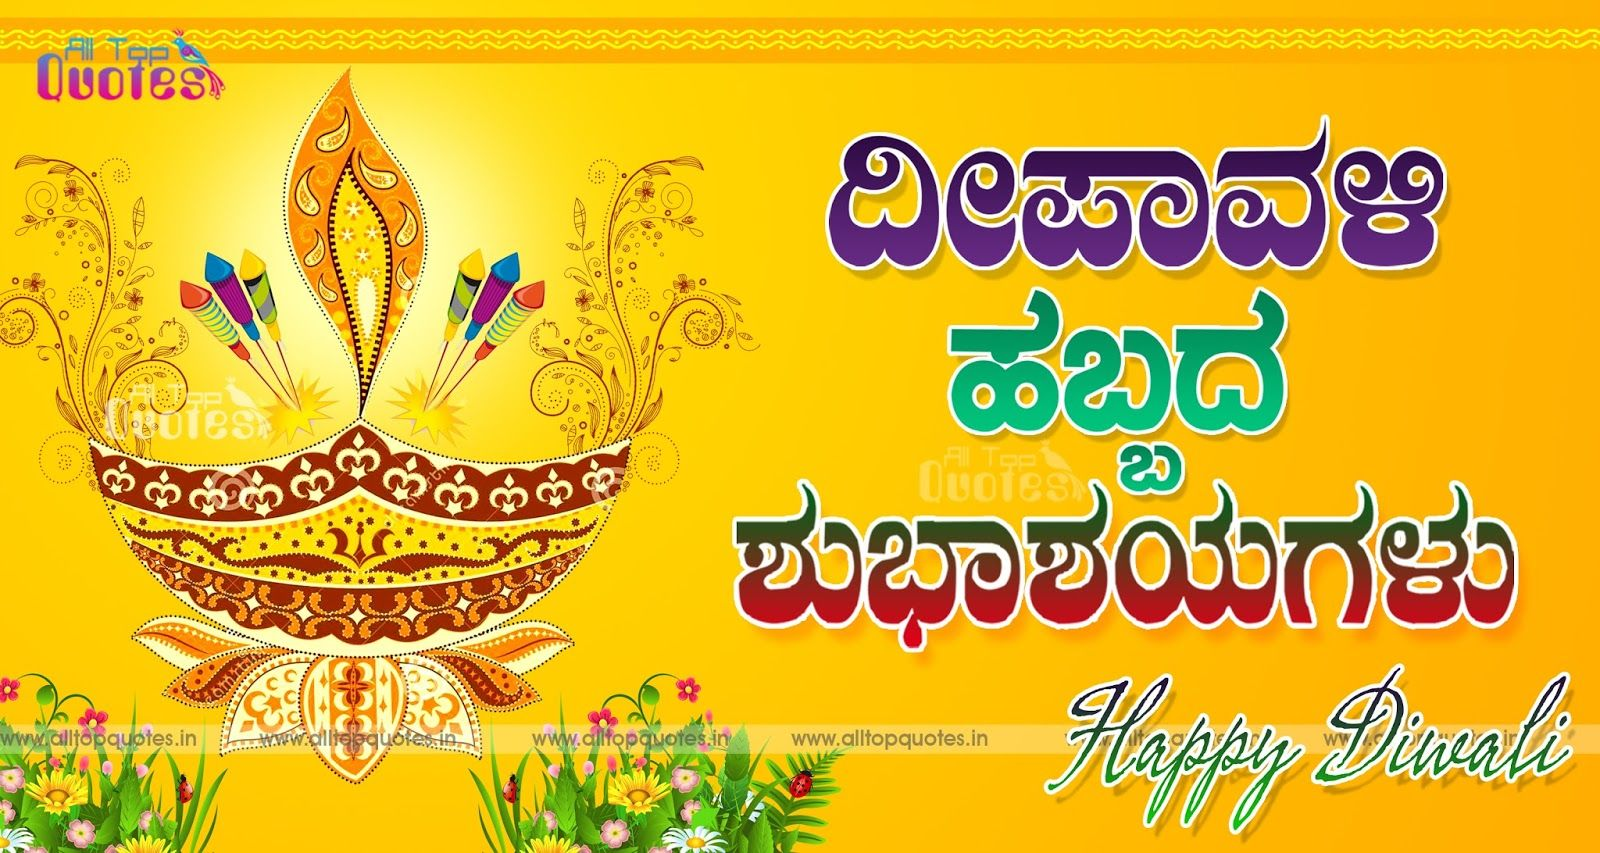 Happy diwali 28deepavali29 kannada quotes and greetings hd happy diwali kannada greetings and quotes online kristyandbryce Gallery